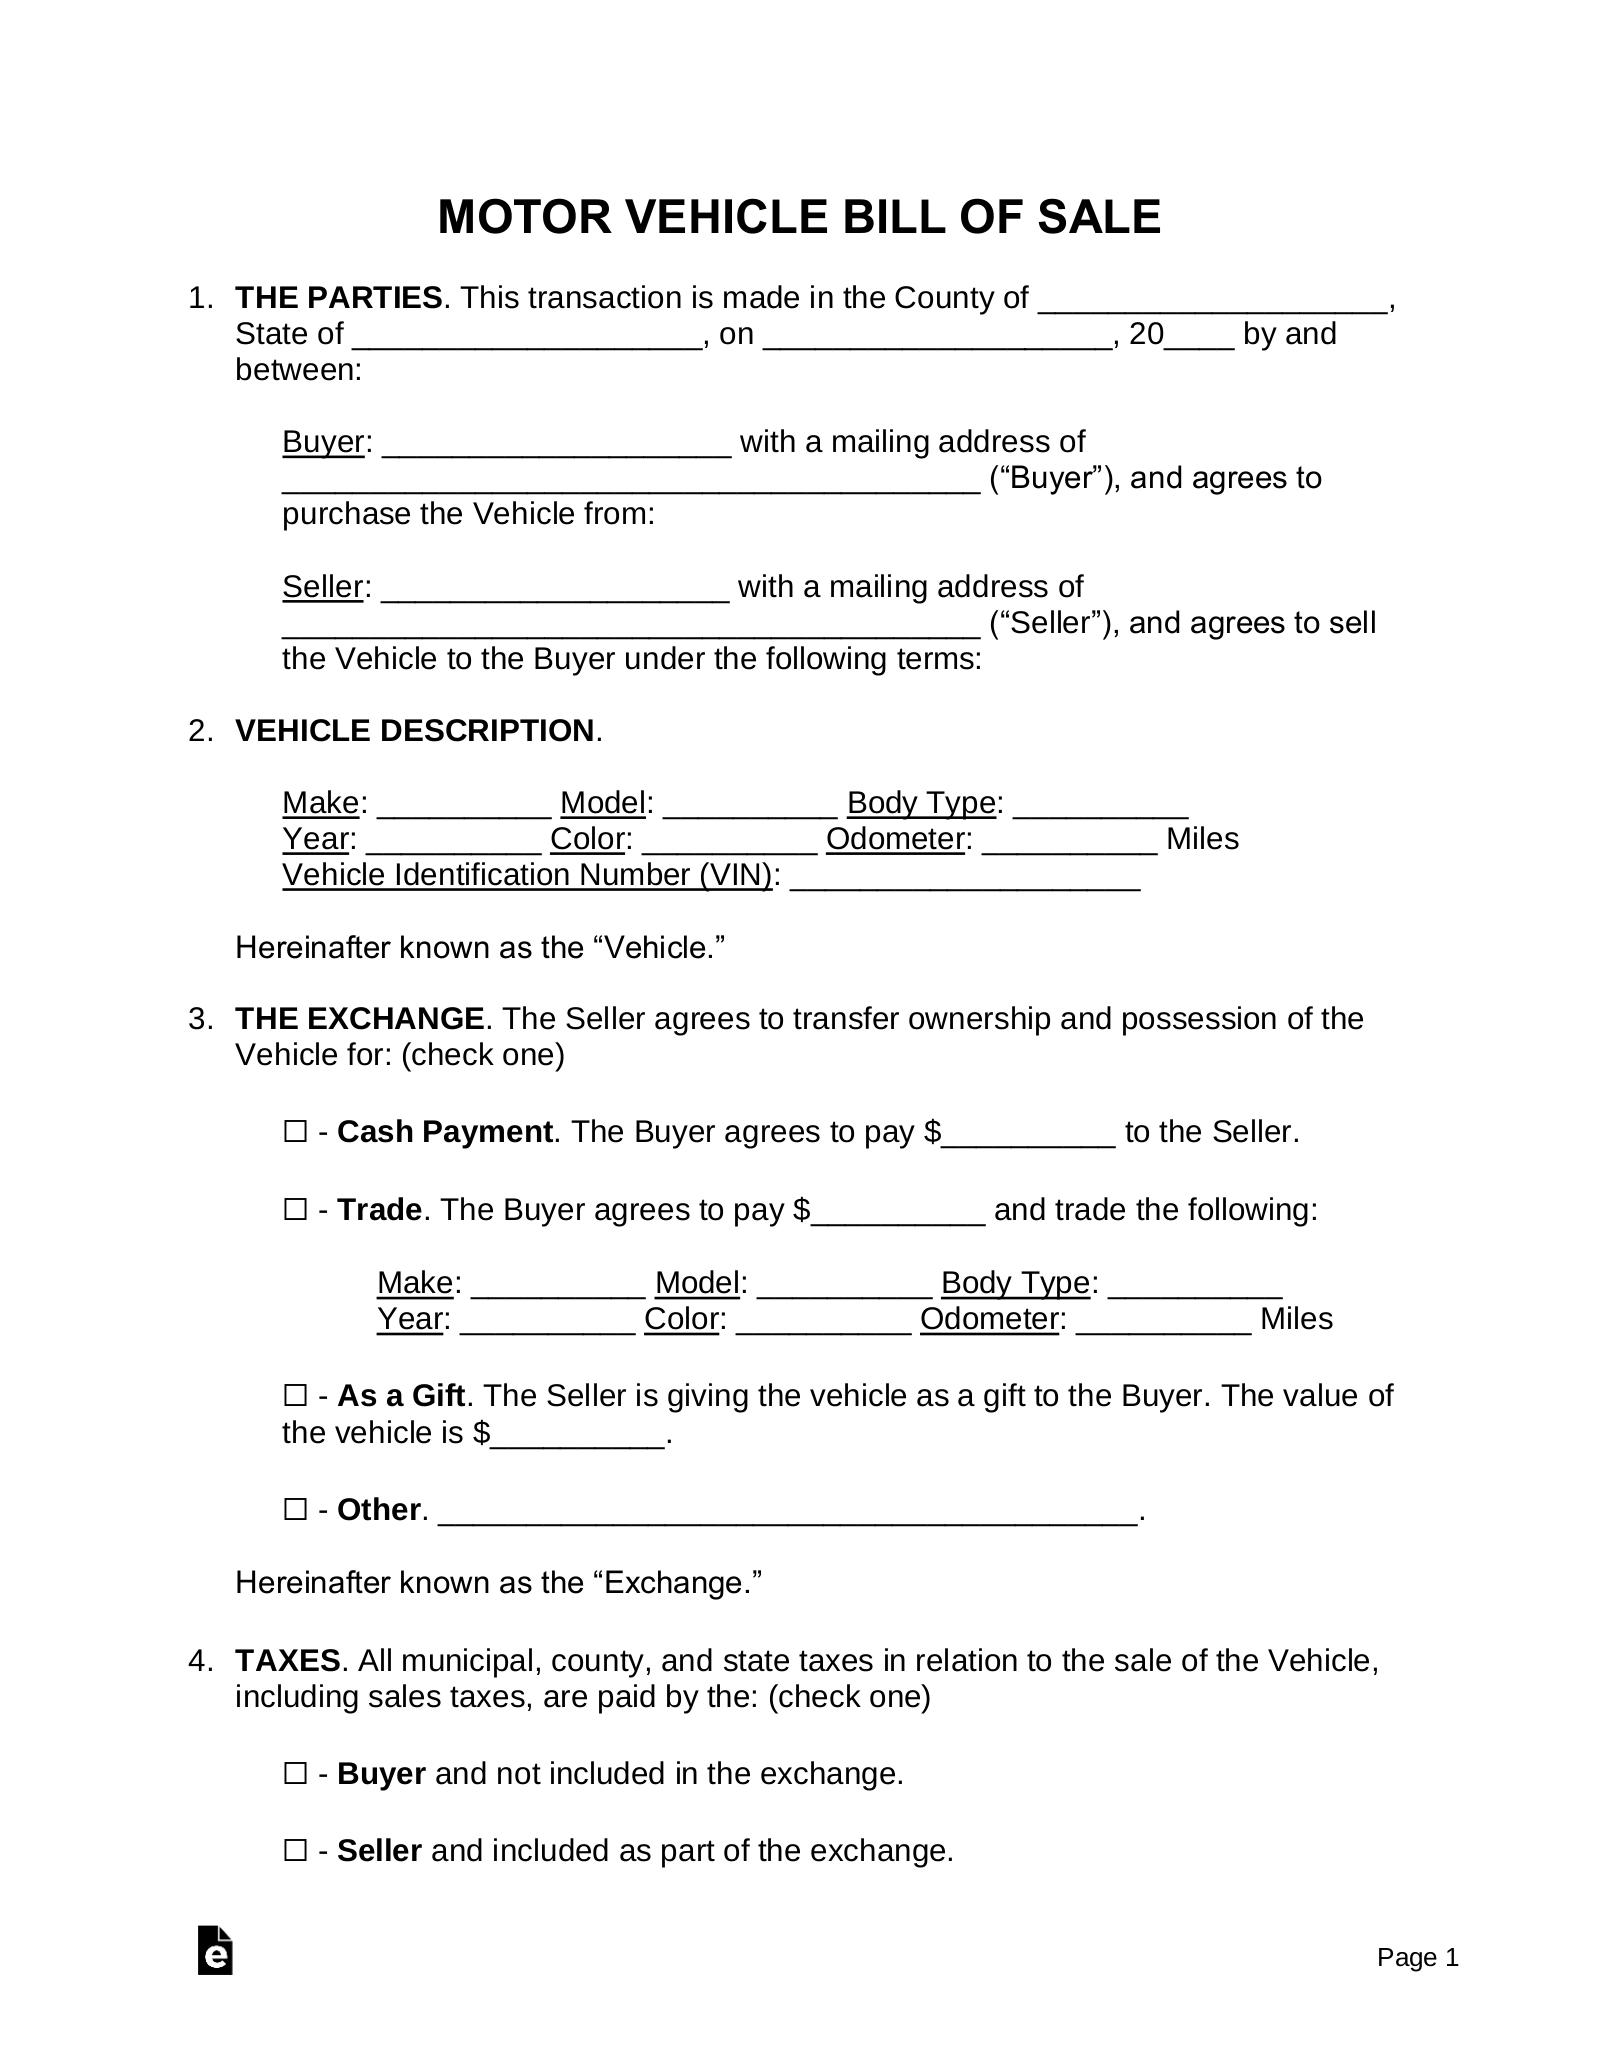 Free Motor Vehicle DMV Bill of Sale Form   Word   PDF – eForms